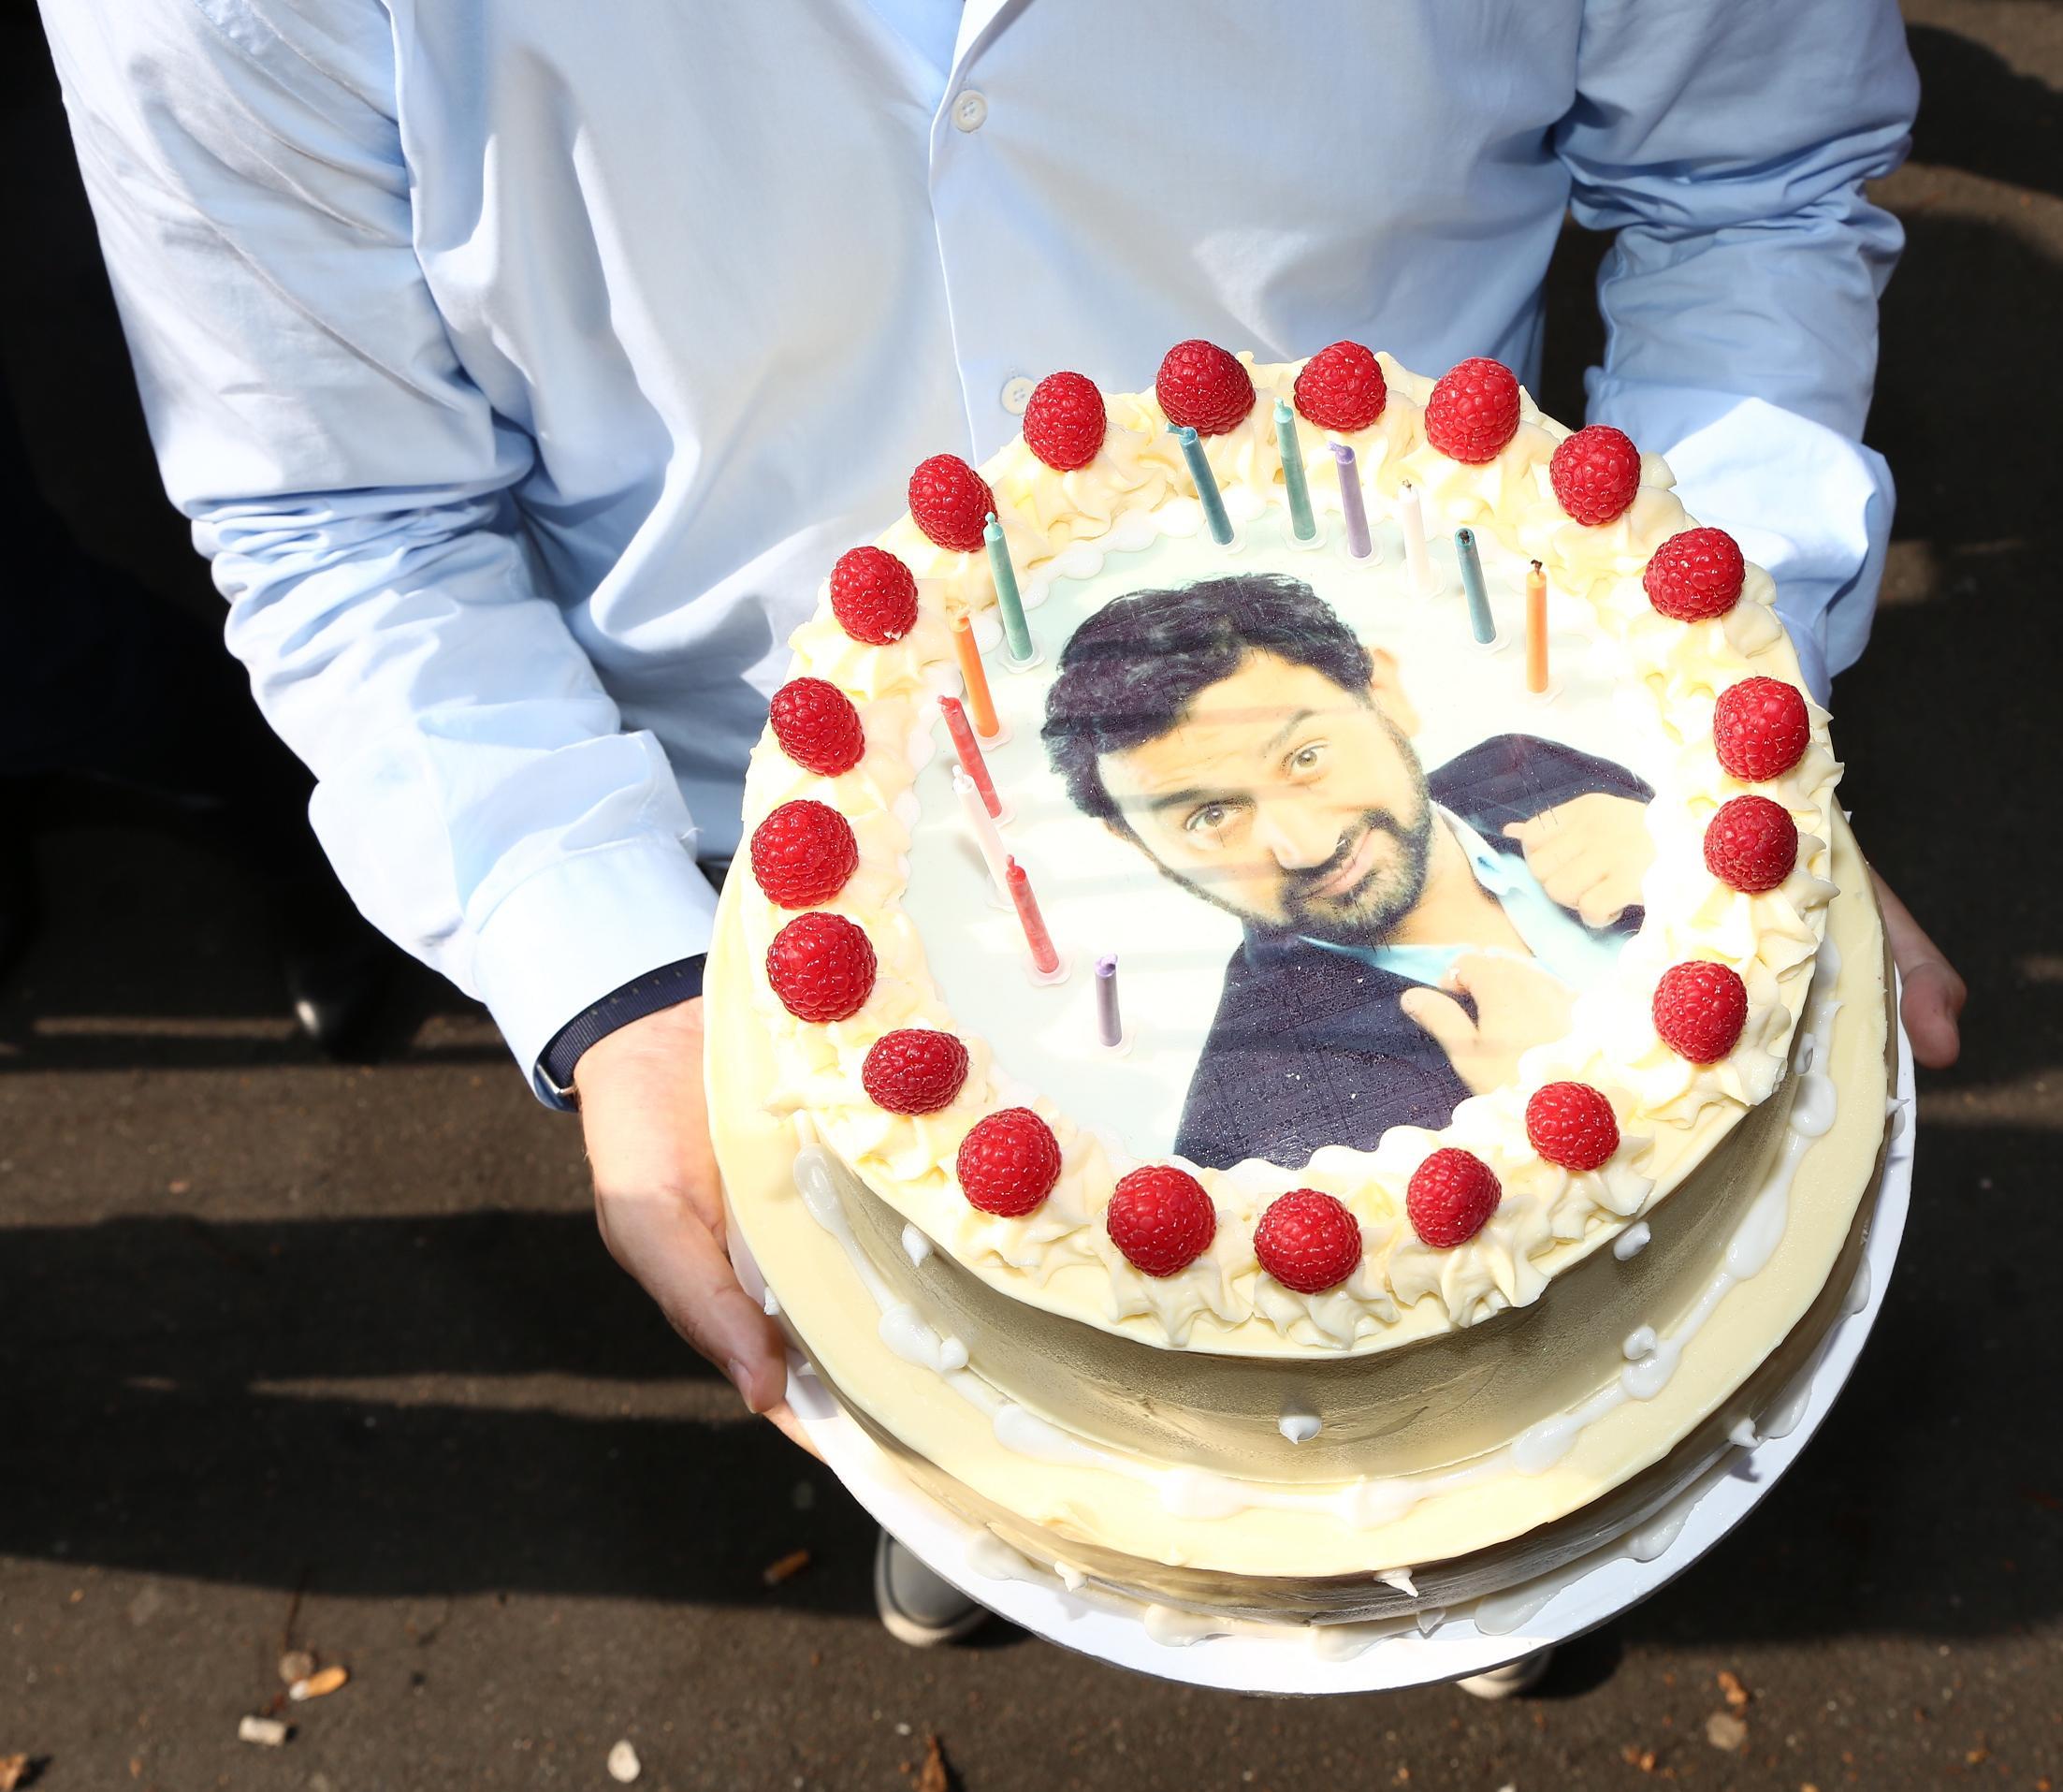 Le gâteau d'anniversaire de Cyril Hanouna  © Wladimir Simic CAPA - Europe 1